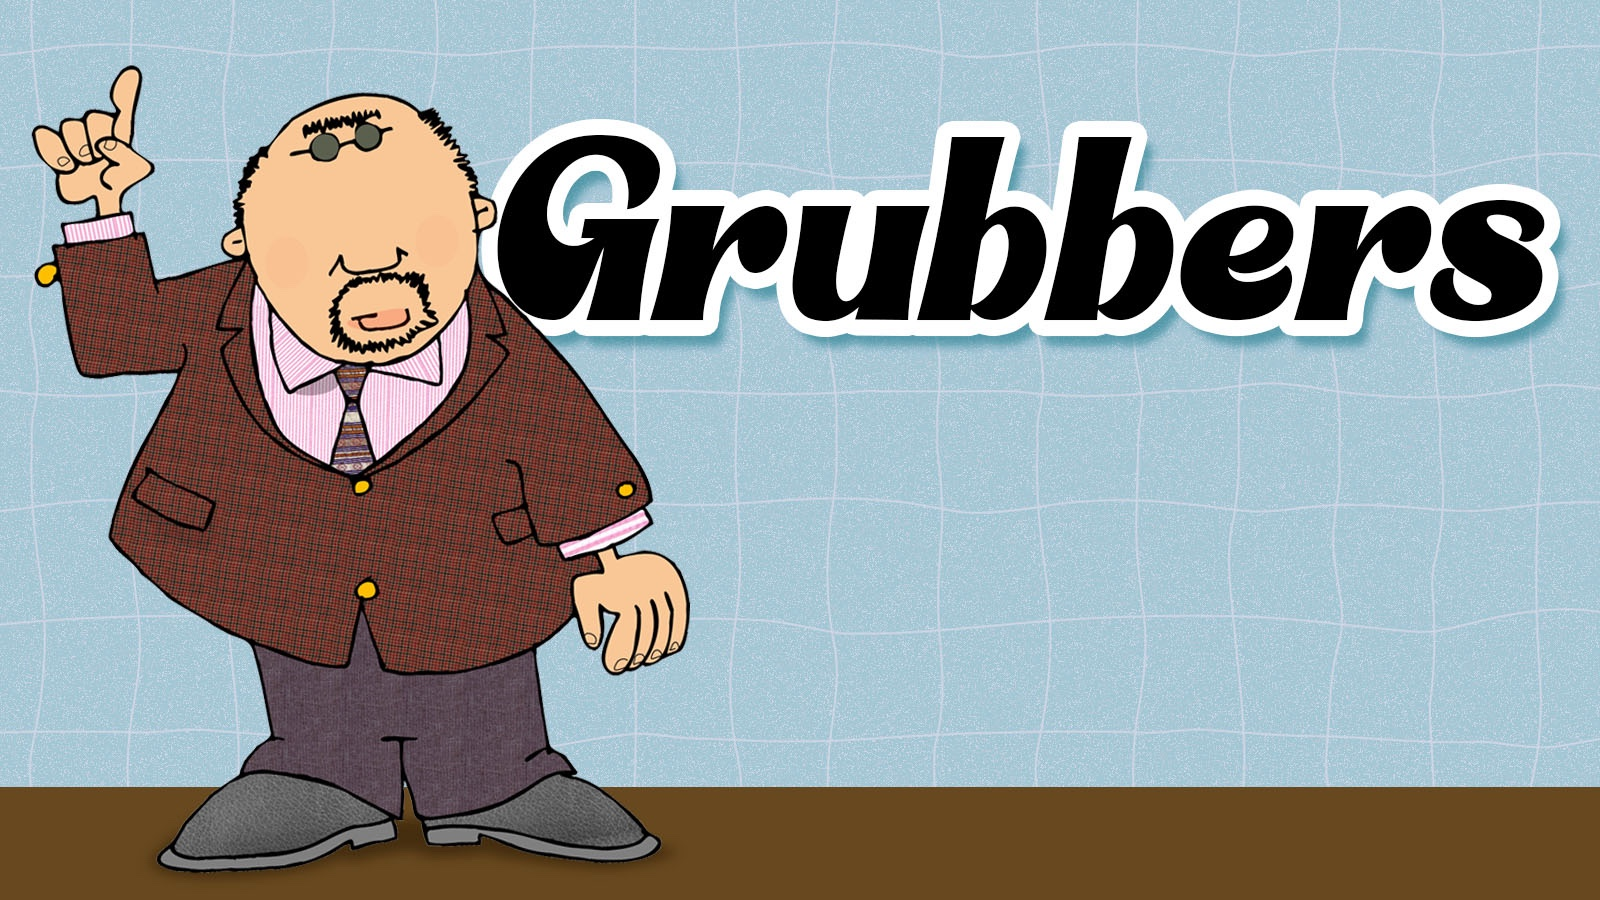 grubbers slang word